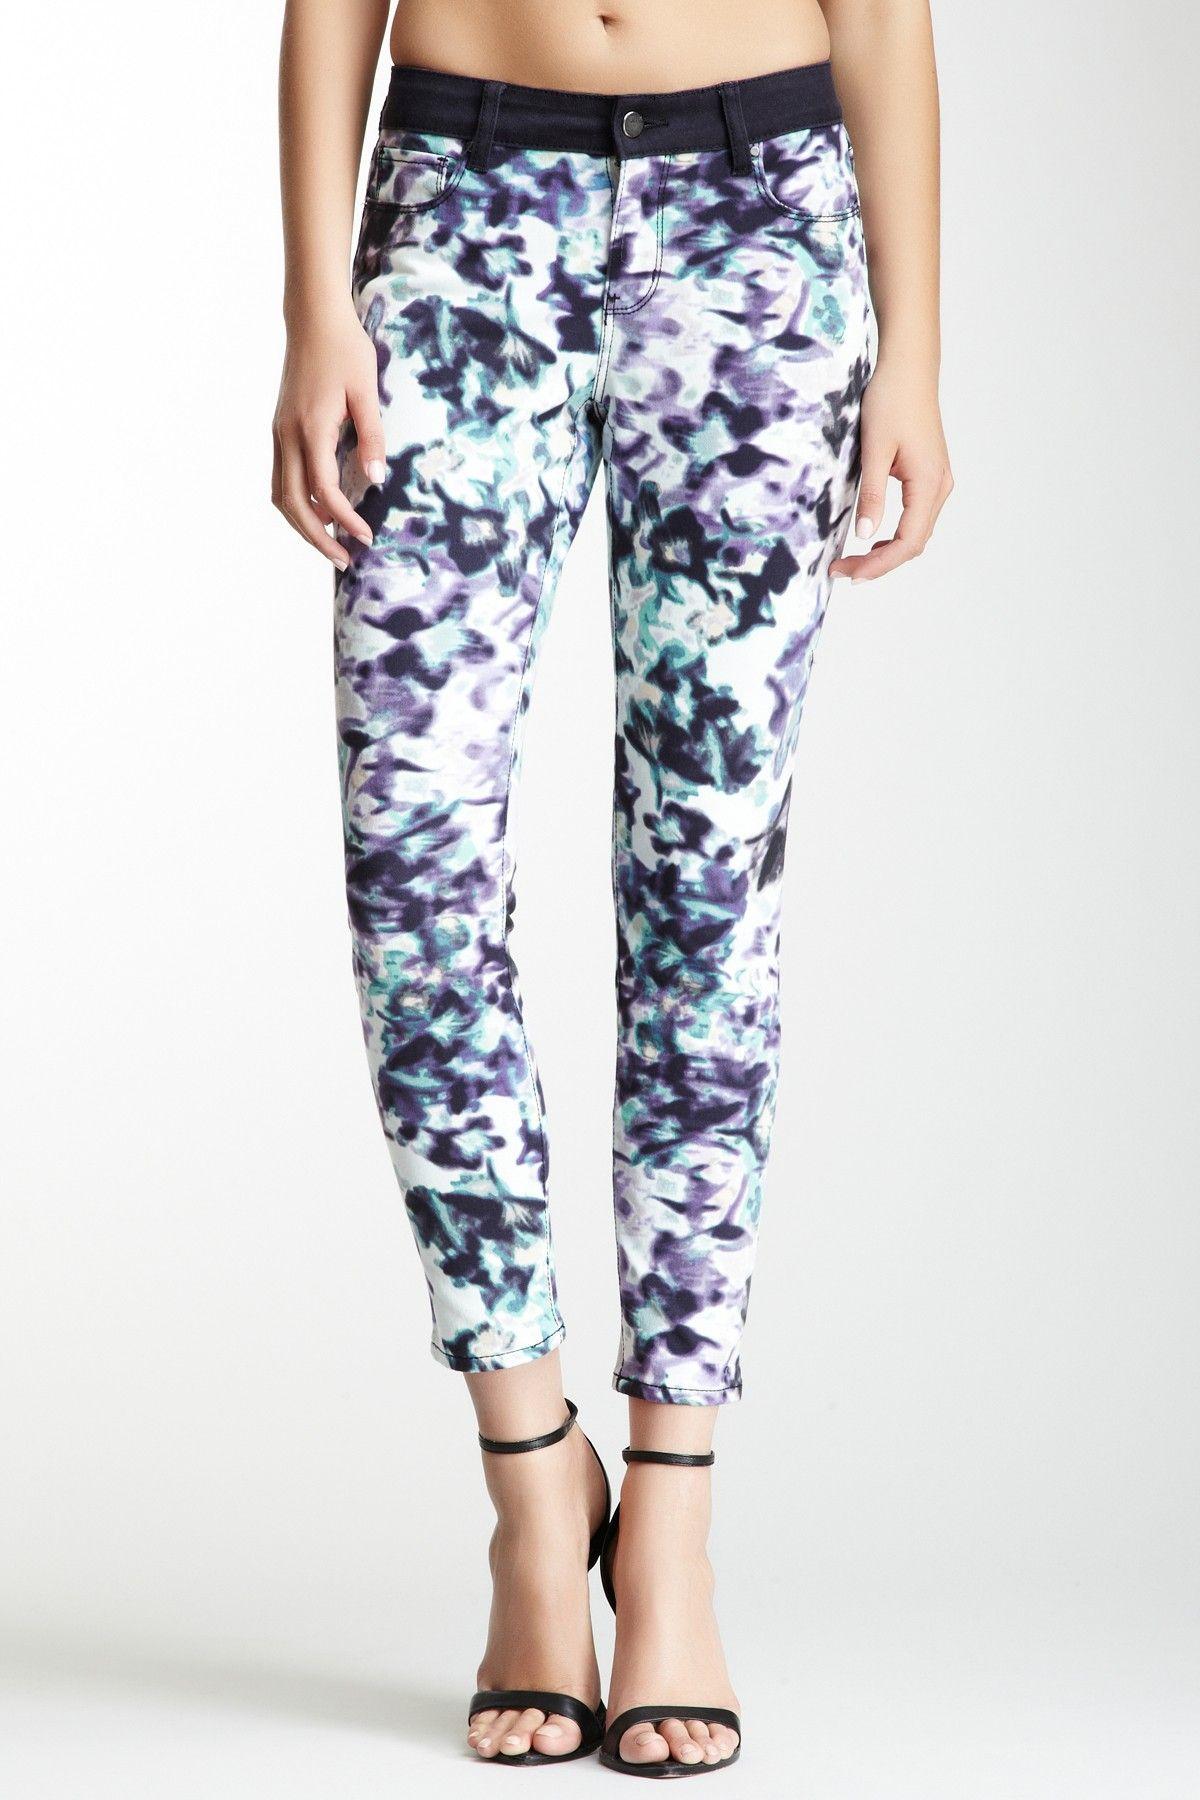 Watercolor jeans